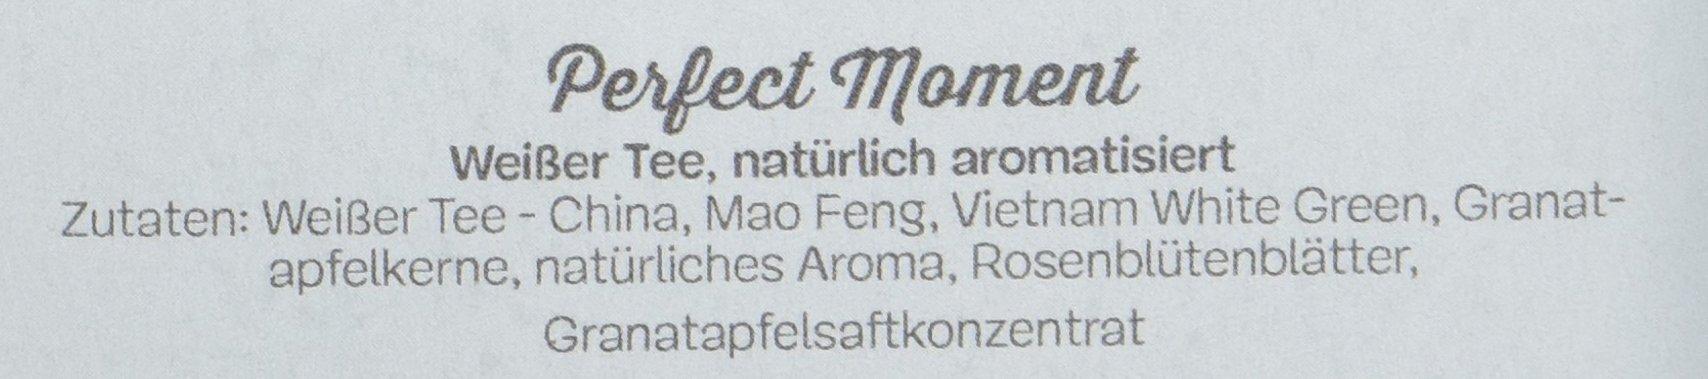 Pi-Tea-Perfect-Moment-Dose-Weier-Tee-Teestation-natrlich-und-vegan-2er-Pack-2-x-75-g